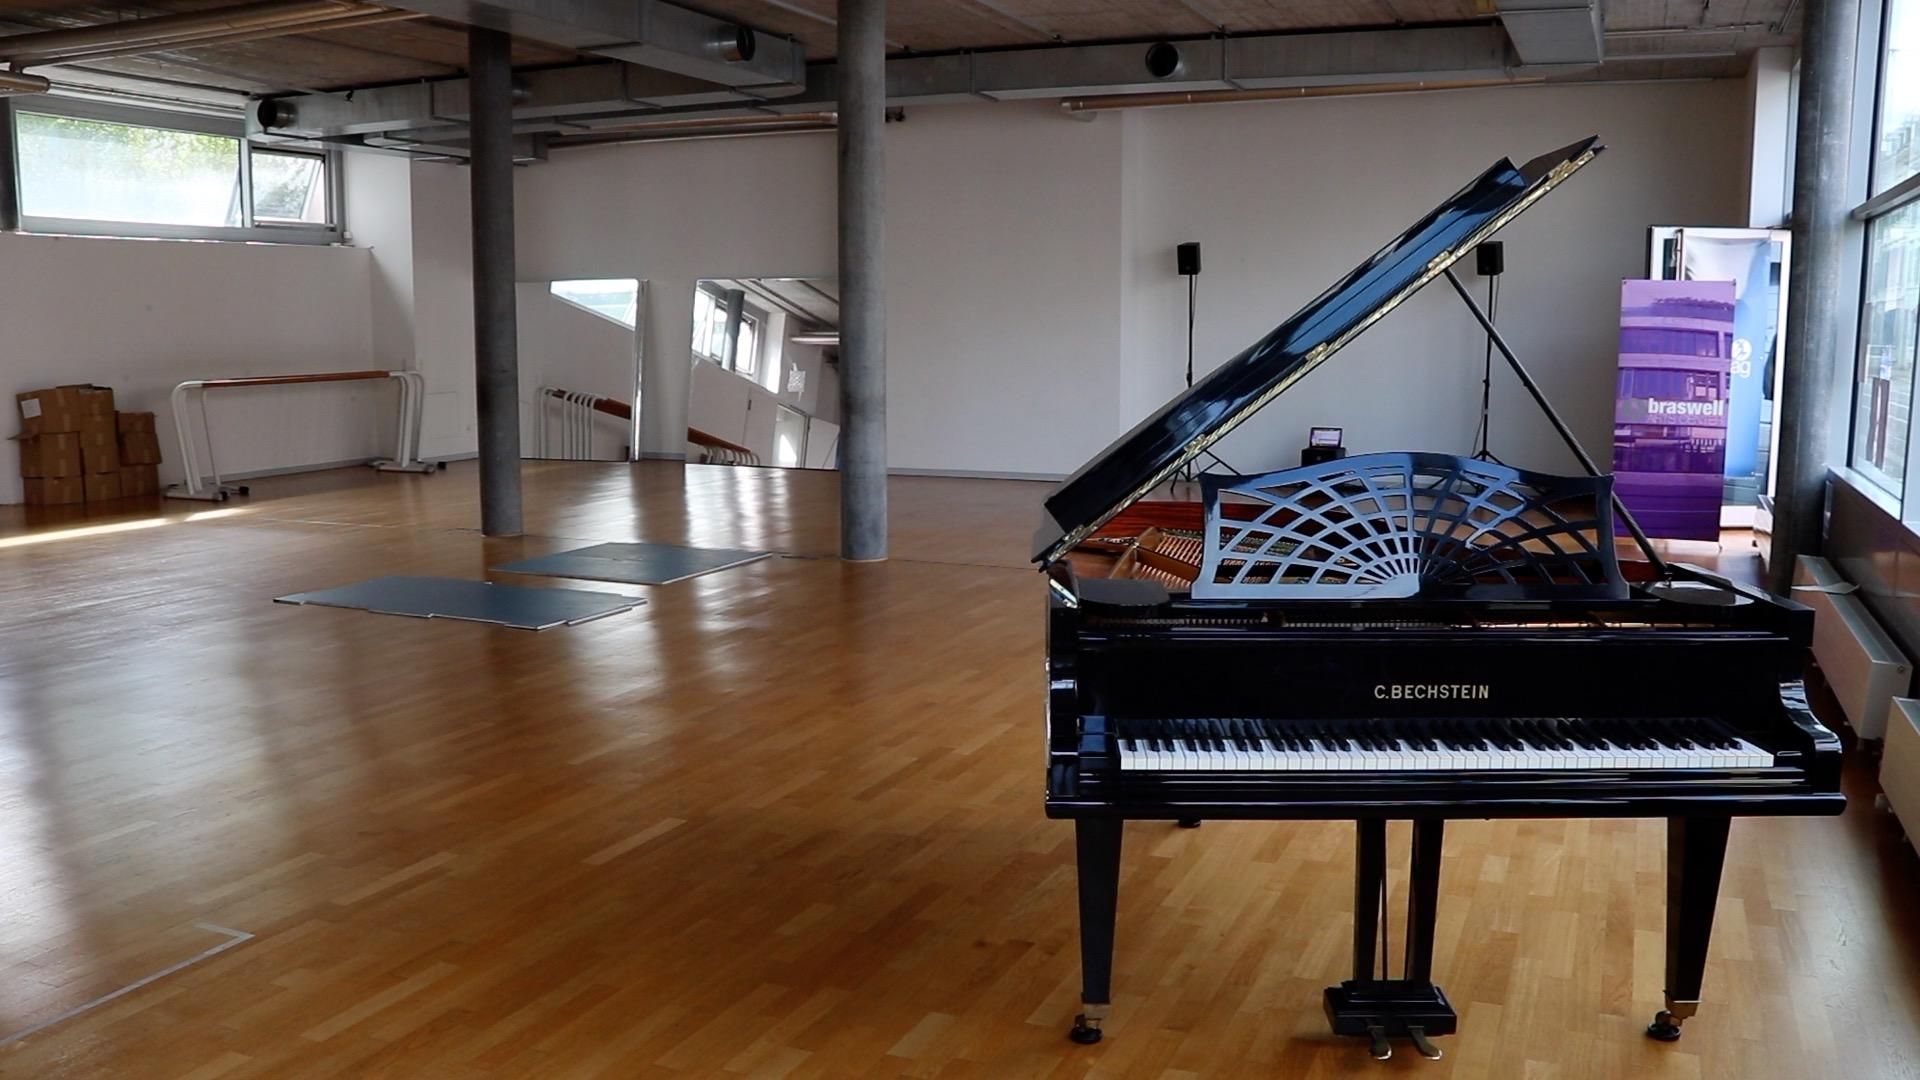 Braswell arts center - Armando Braswell